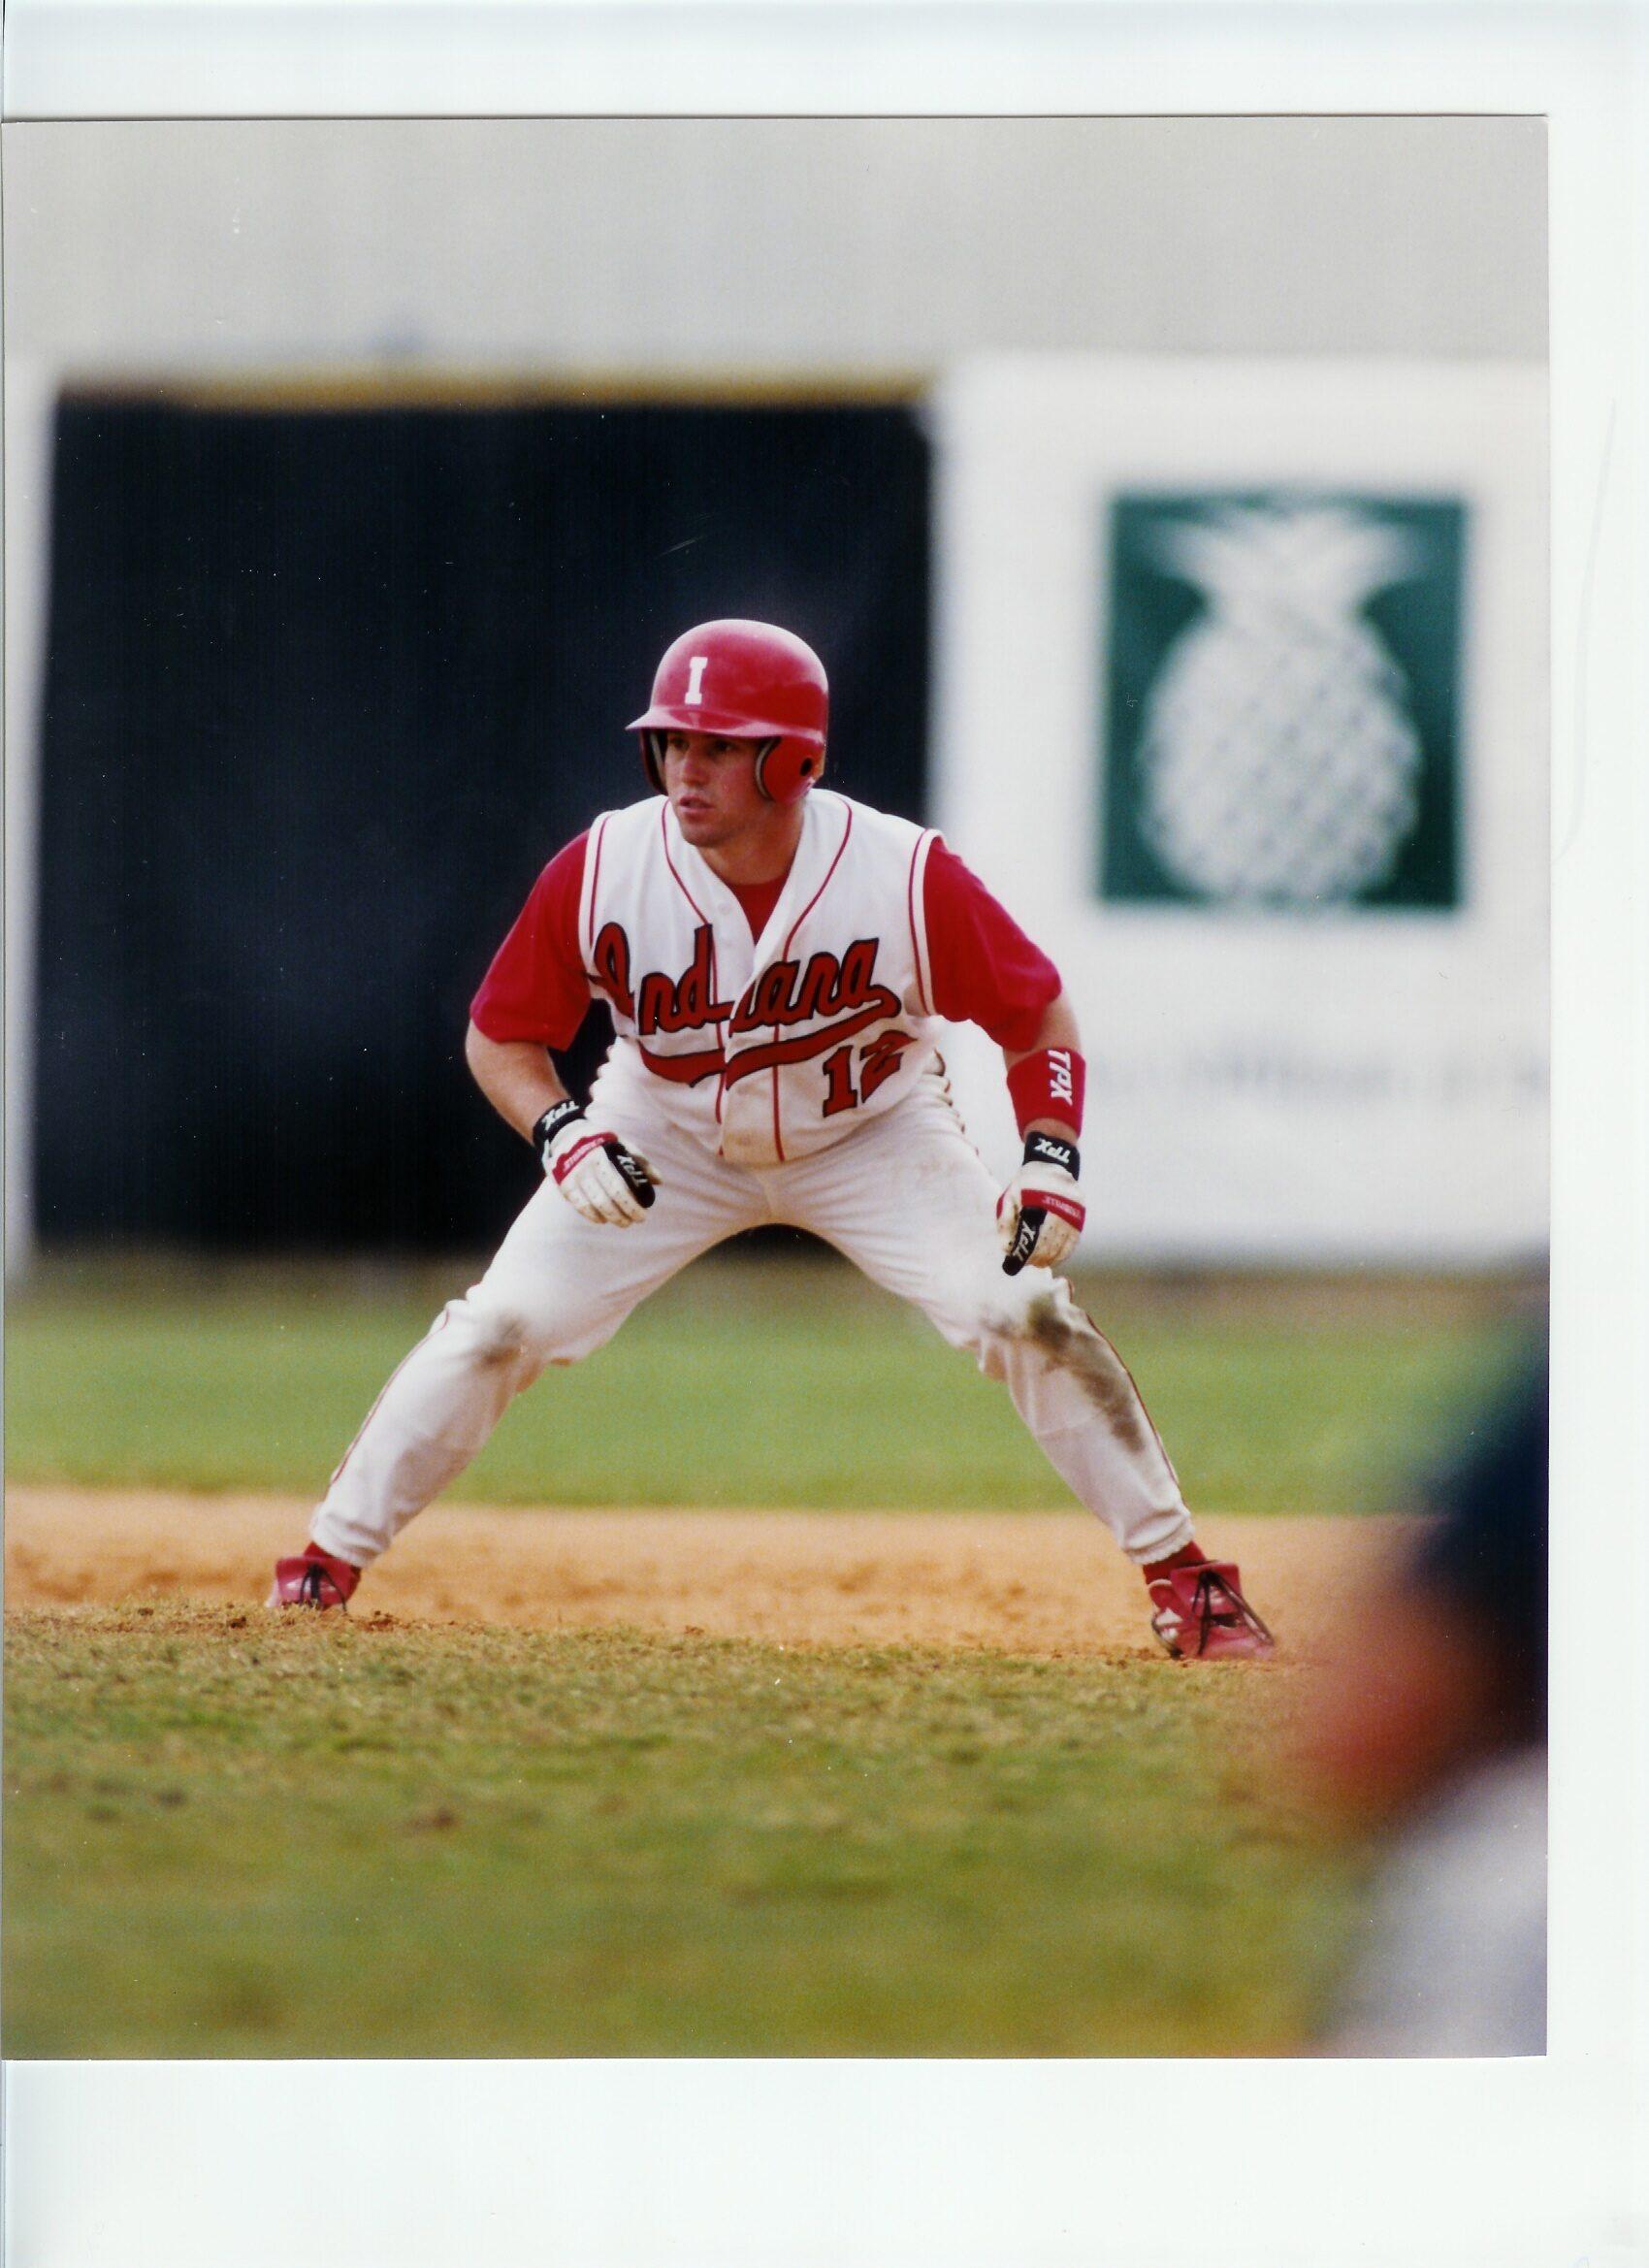 About Chicago Baseball Training Youth Baseball Coaching Jw Baseball